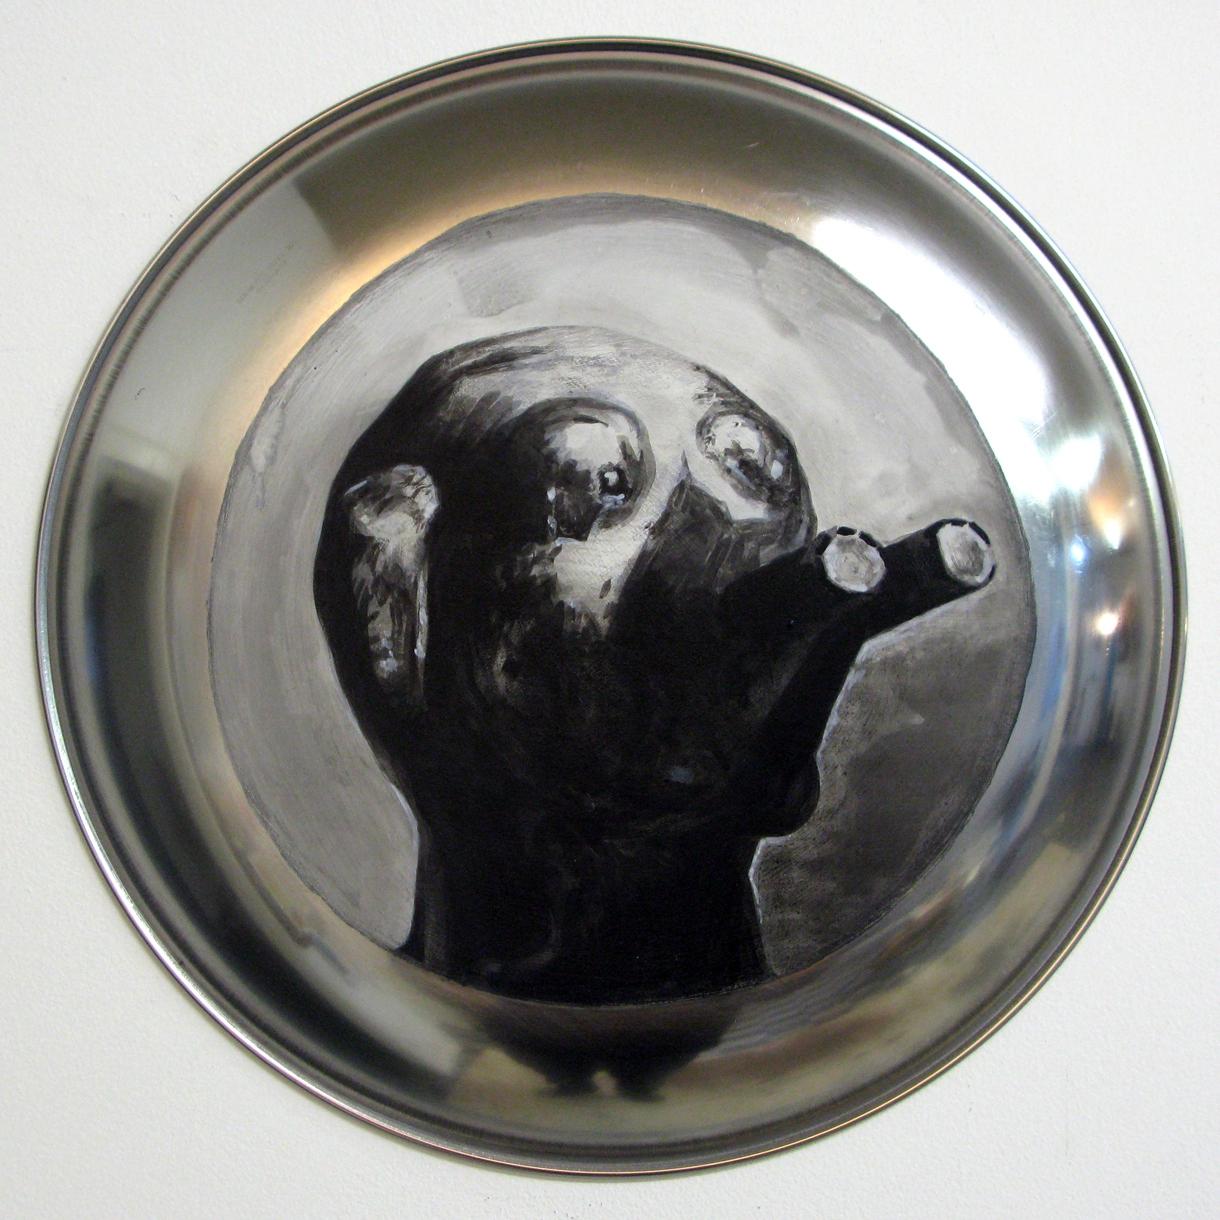 ADAM NORTON  Alien Head 1  2010 acrylic on steel  31 ×31 cm